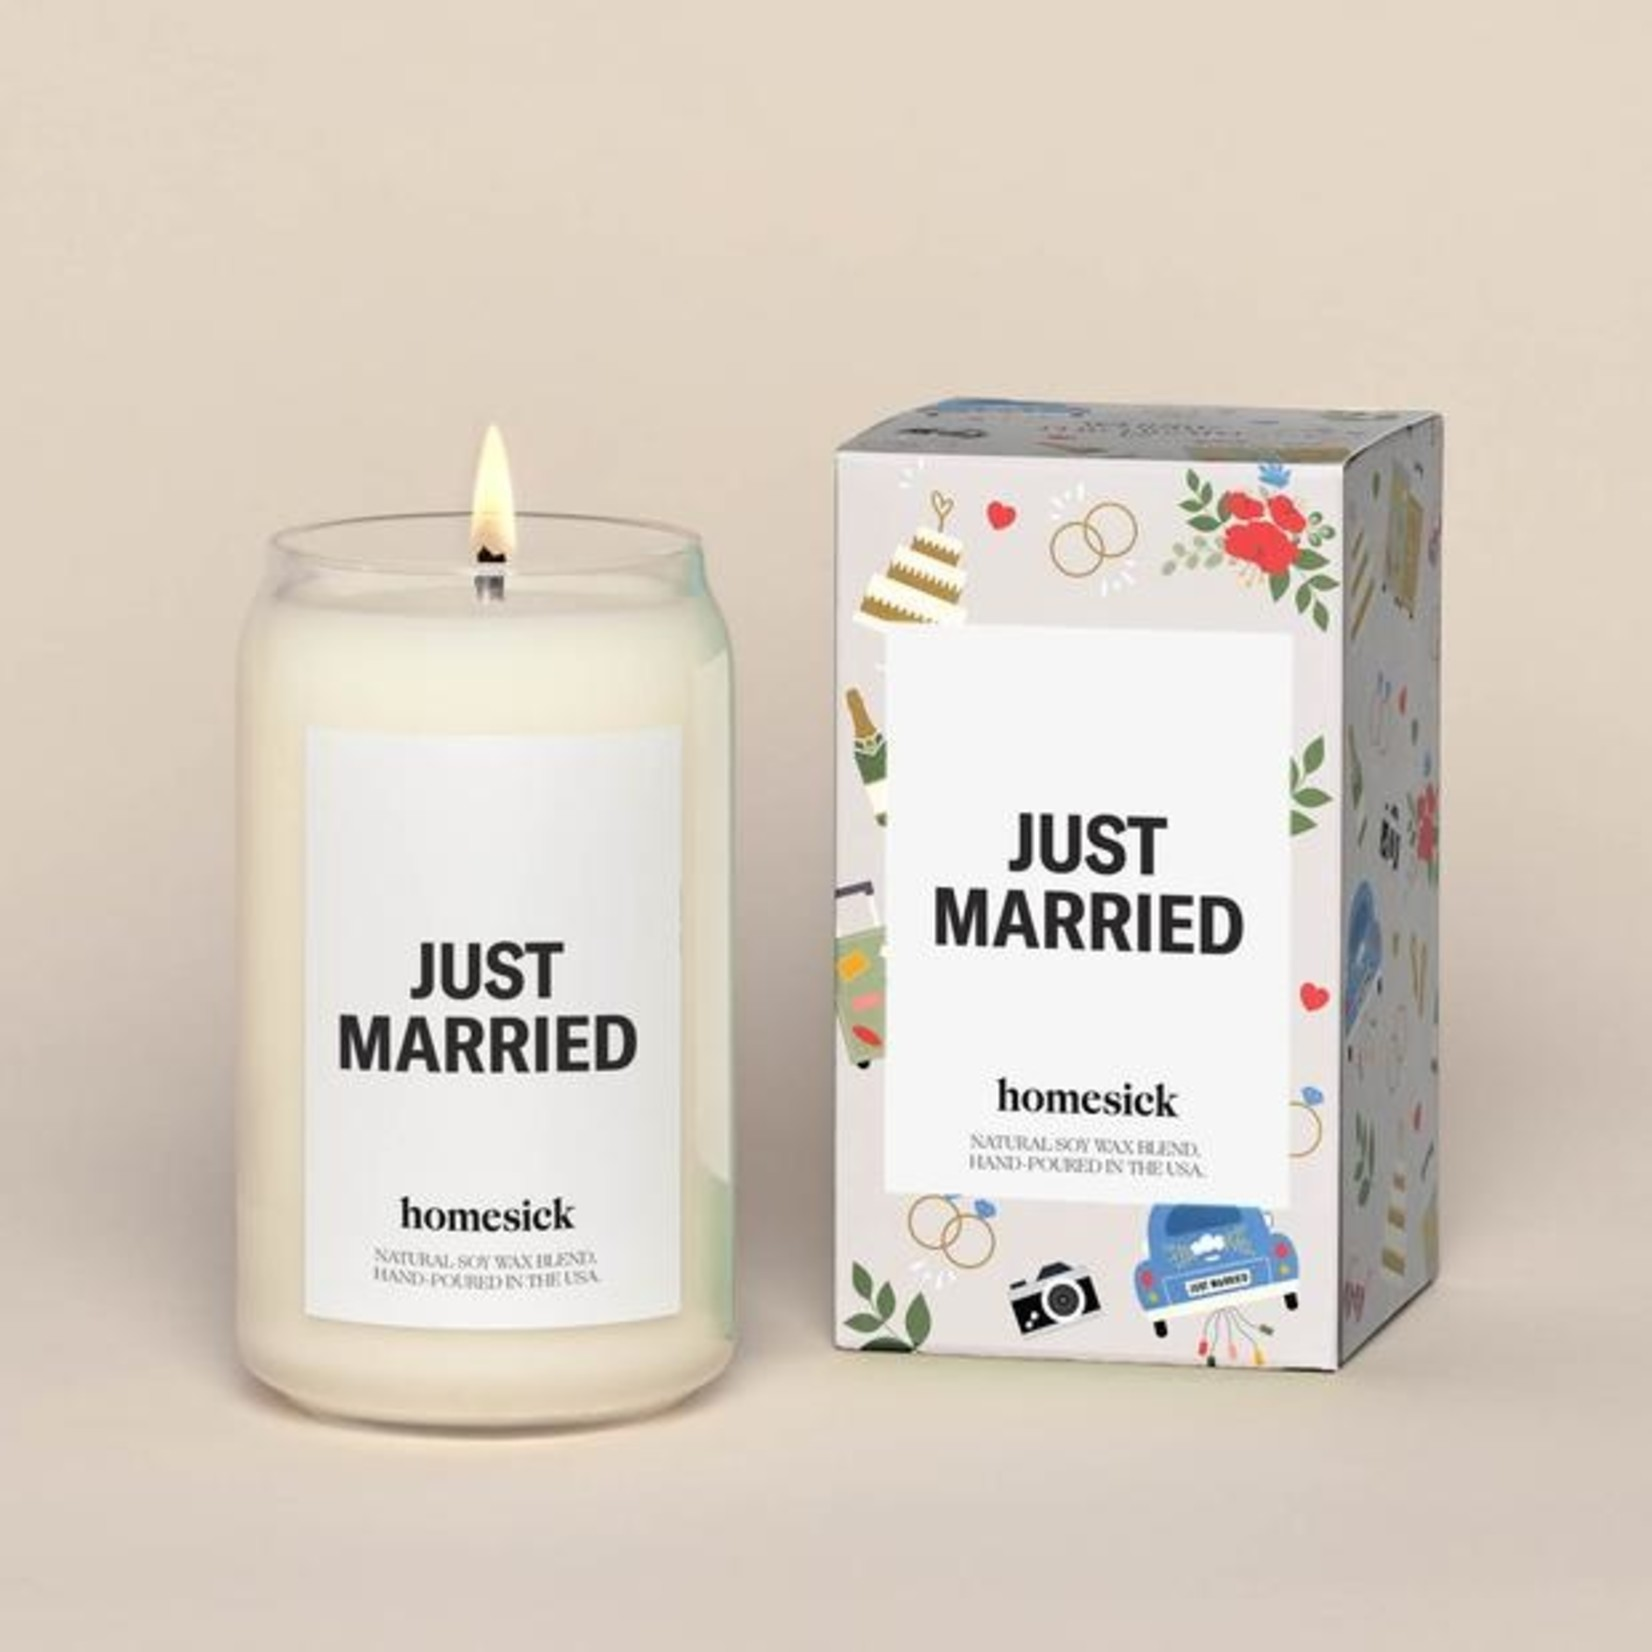 Homesick Candle Line